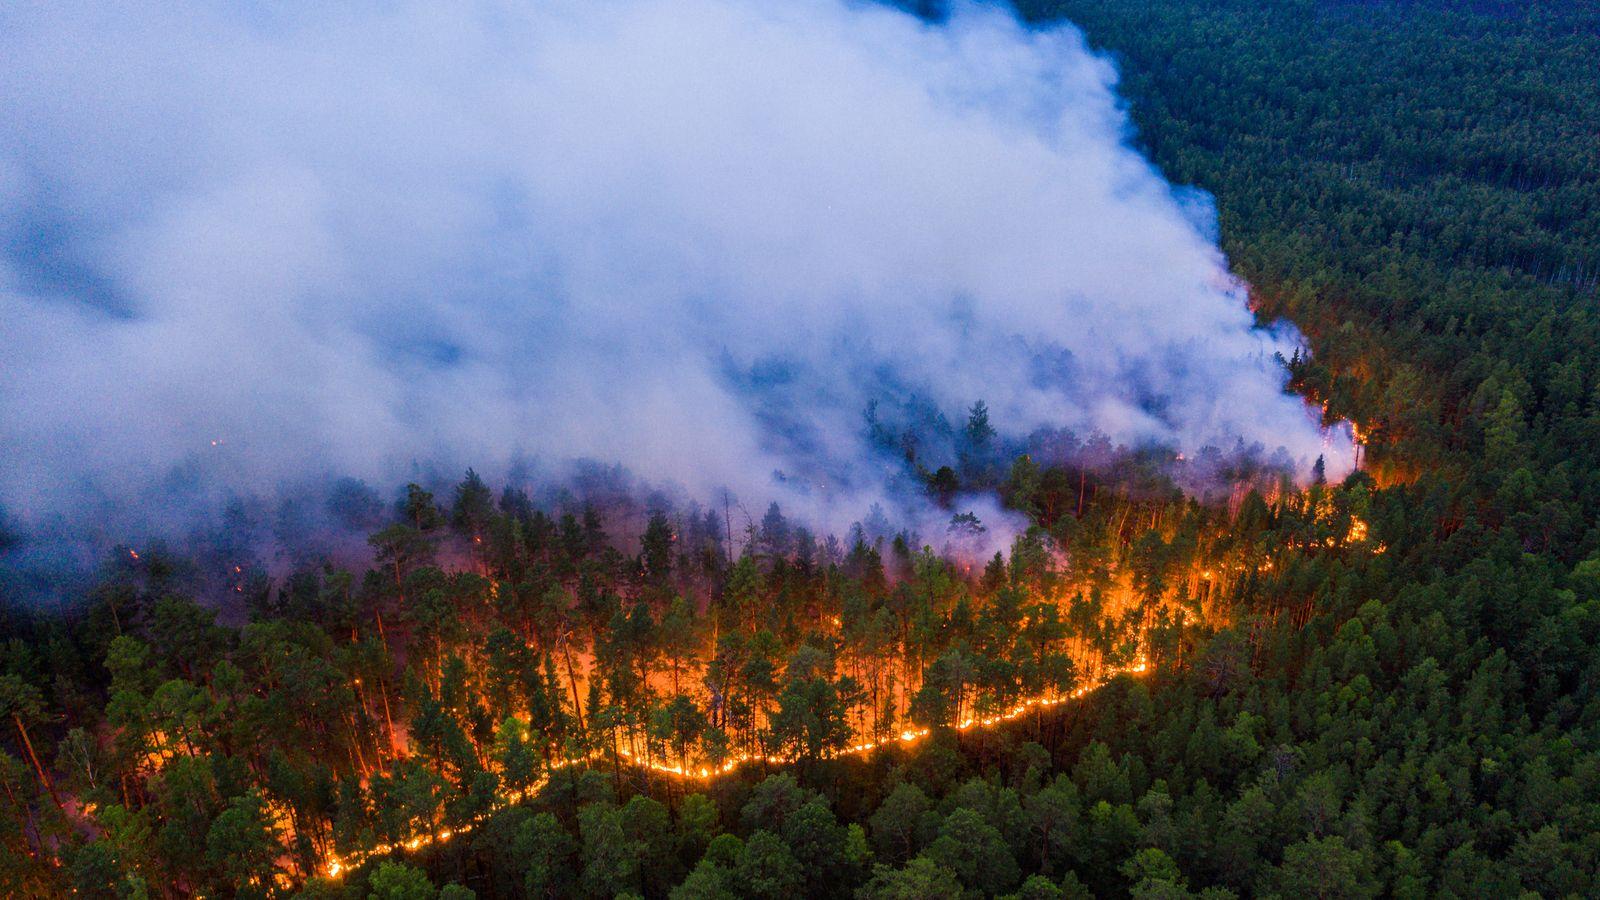 An aerial view shows a forest fire in Krasnoyarsk Region